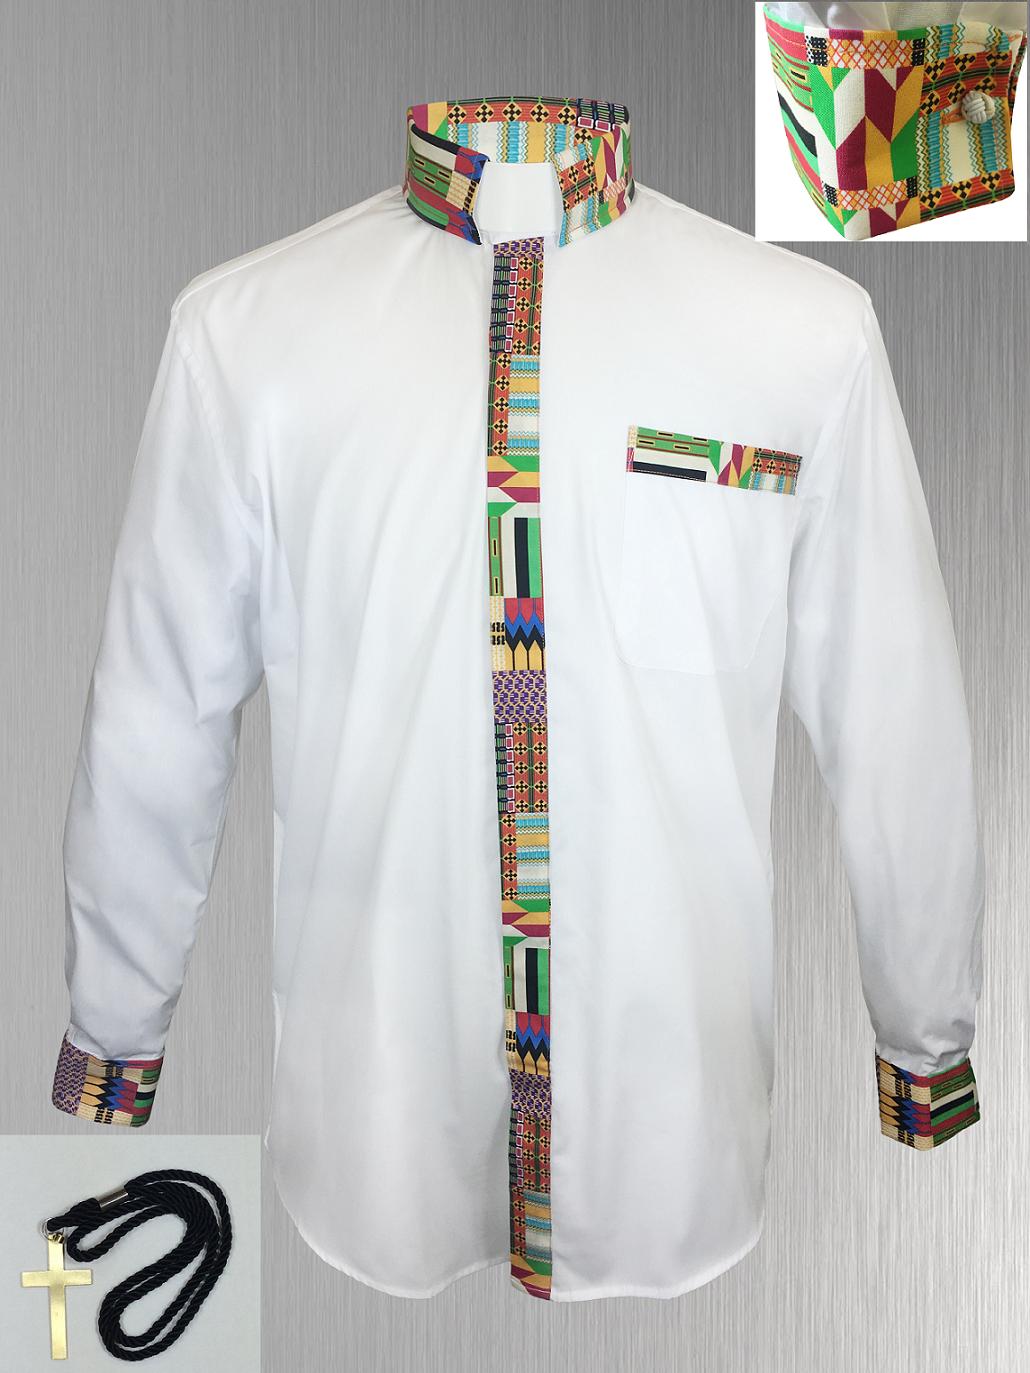 147. Custom Edition Kwangali Cloth Men's Tab Collar Clergy Shirt Set - White